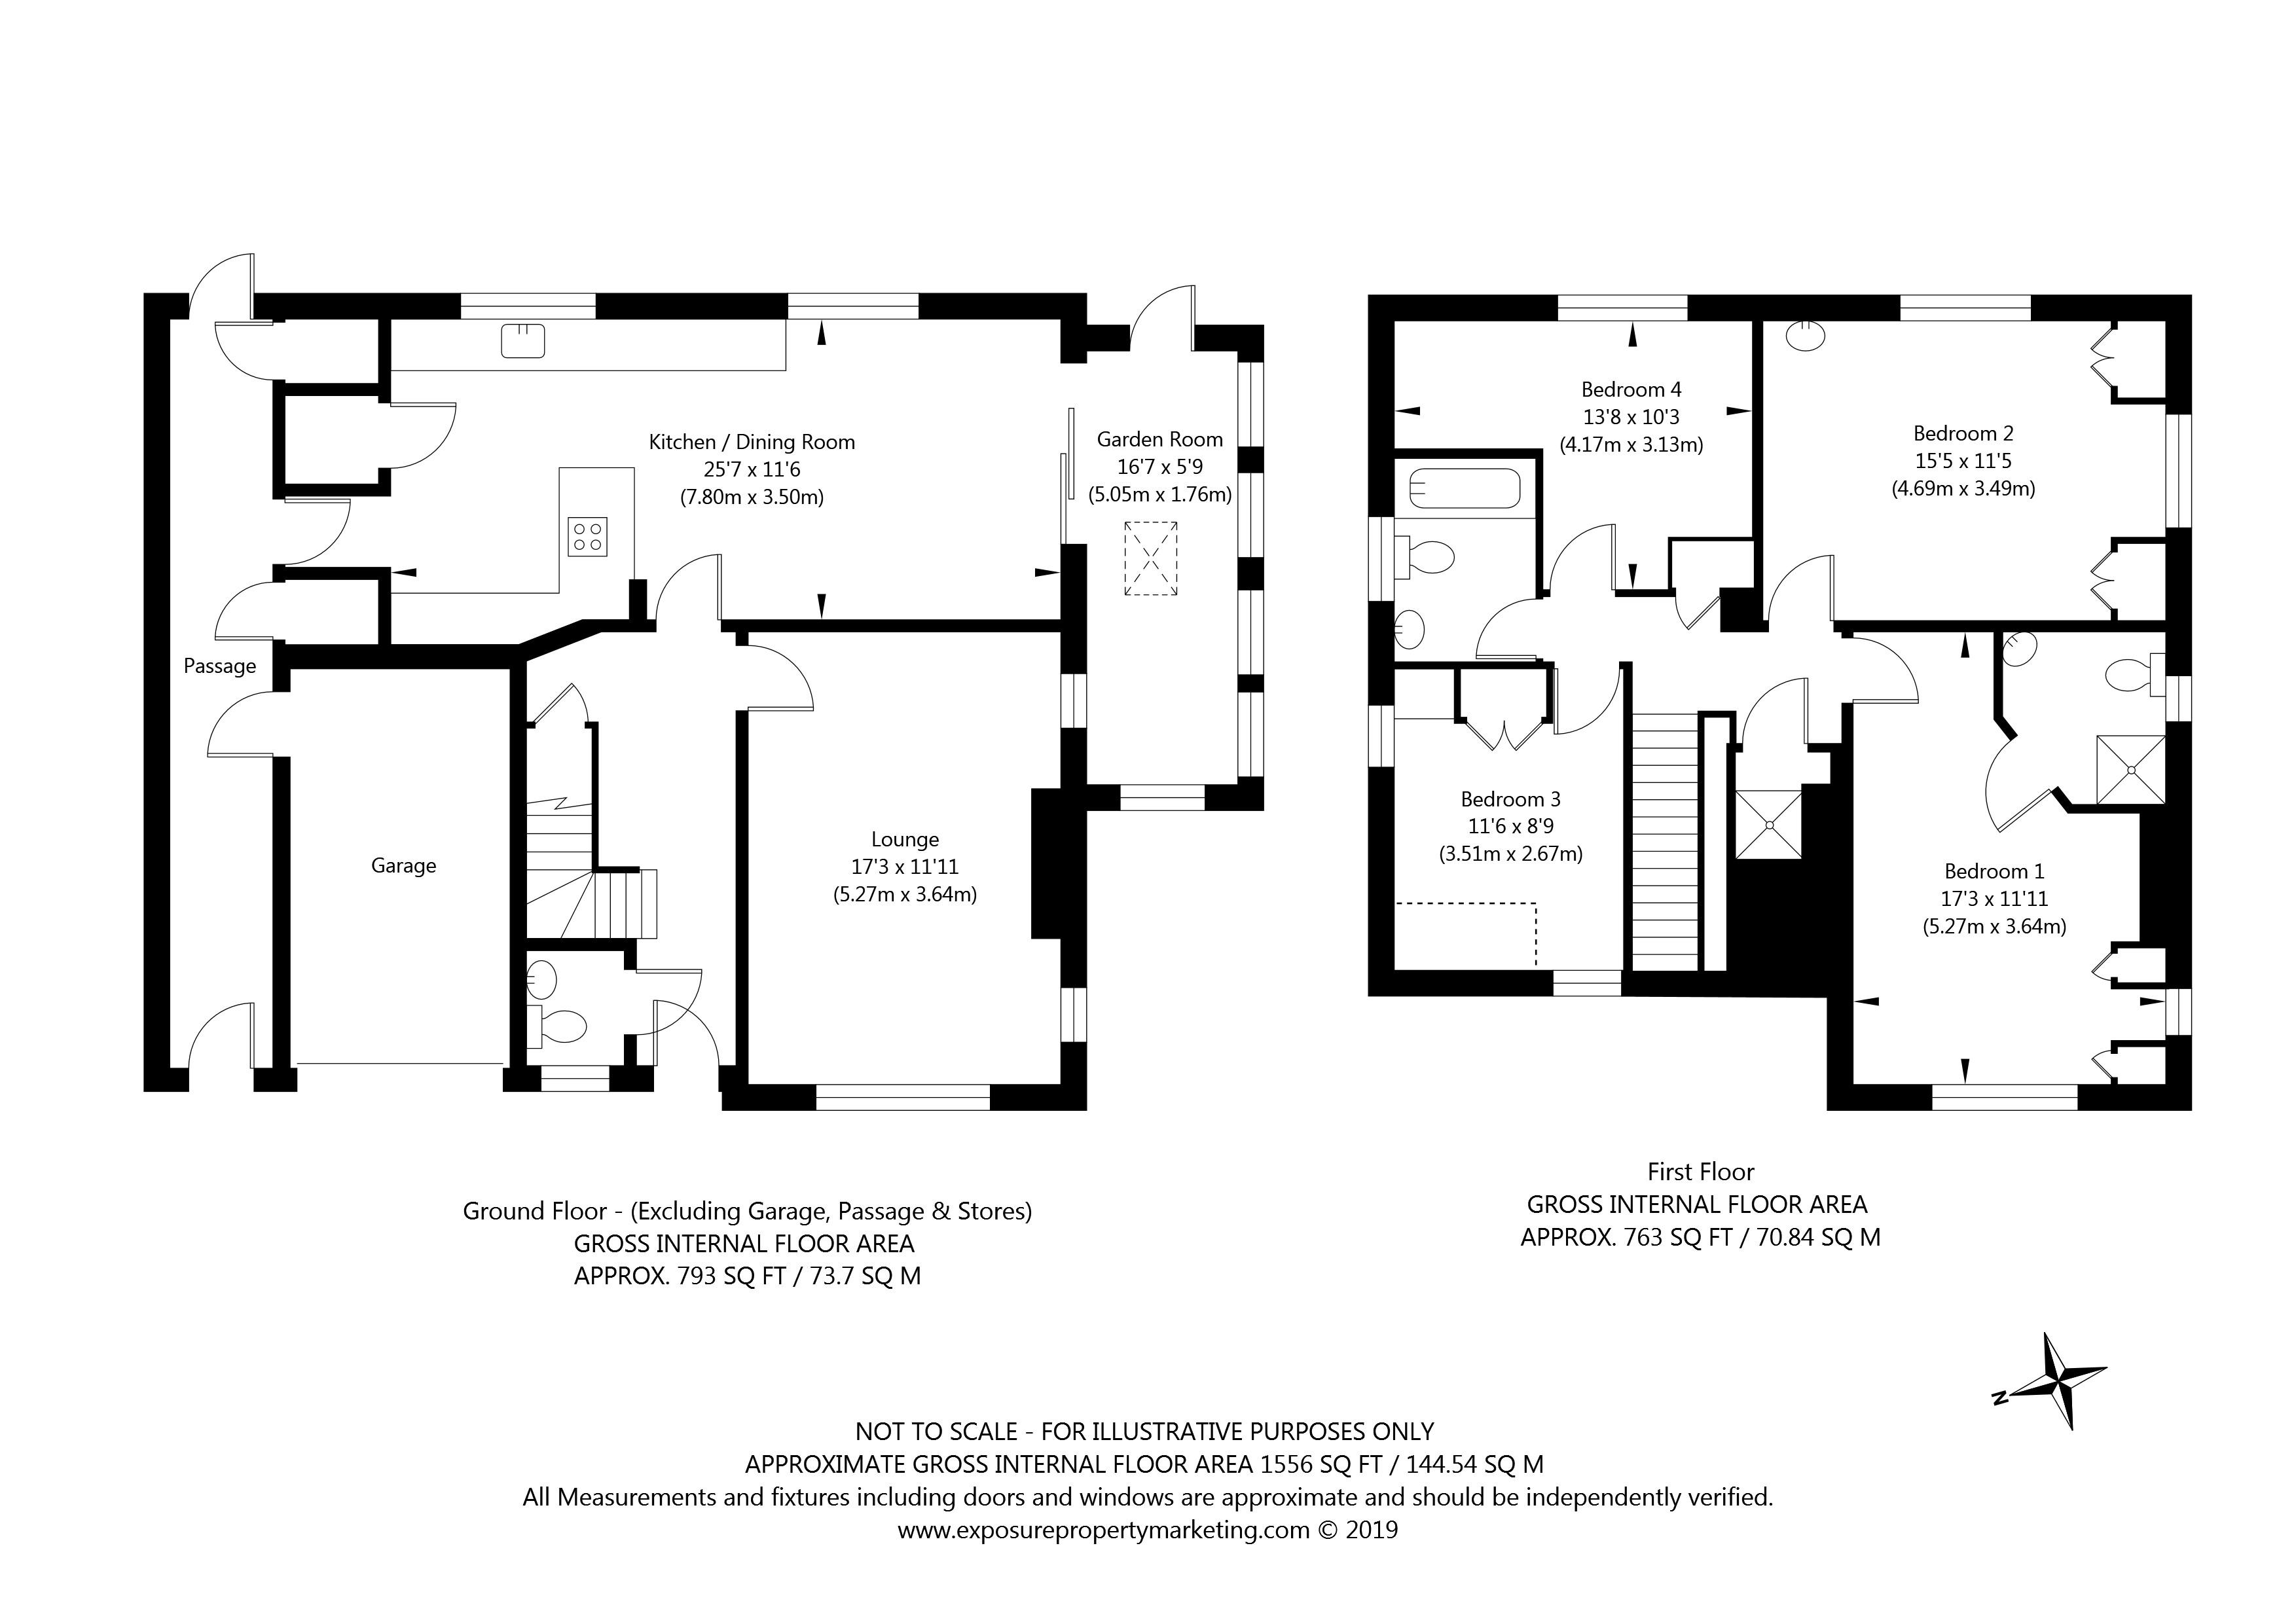 31 White House Gardens, York property floorplan